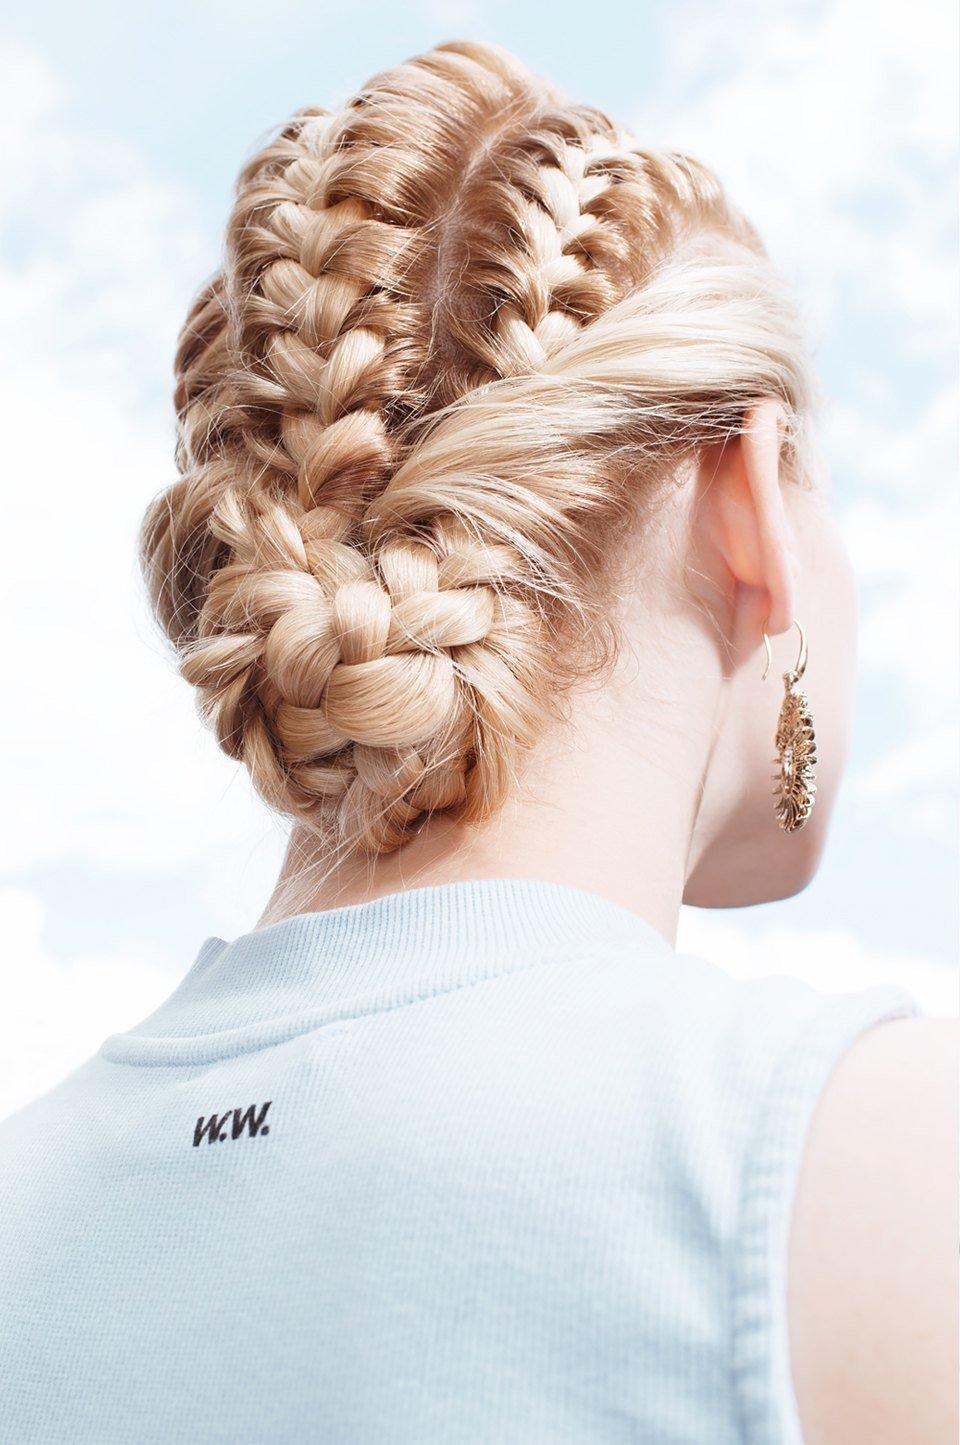 Колоски картинки волосы